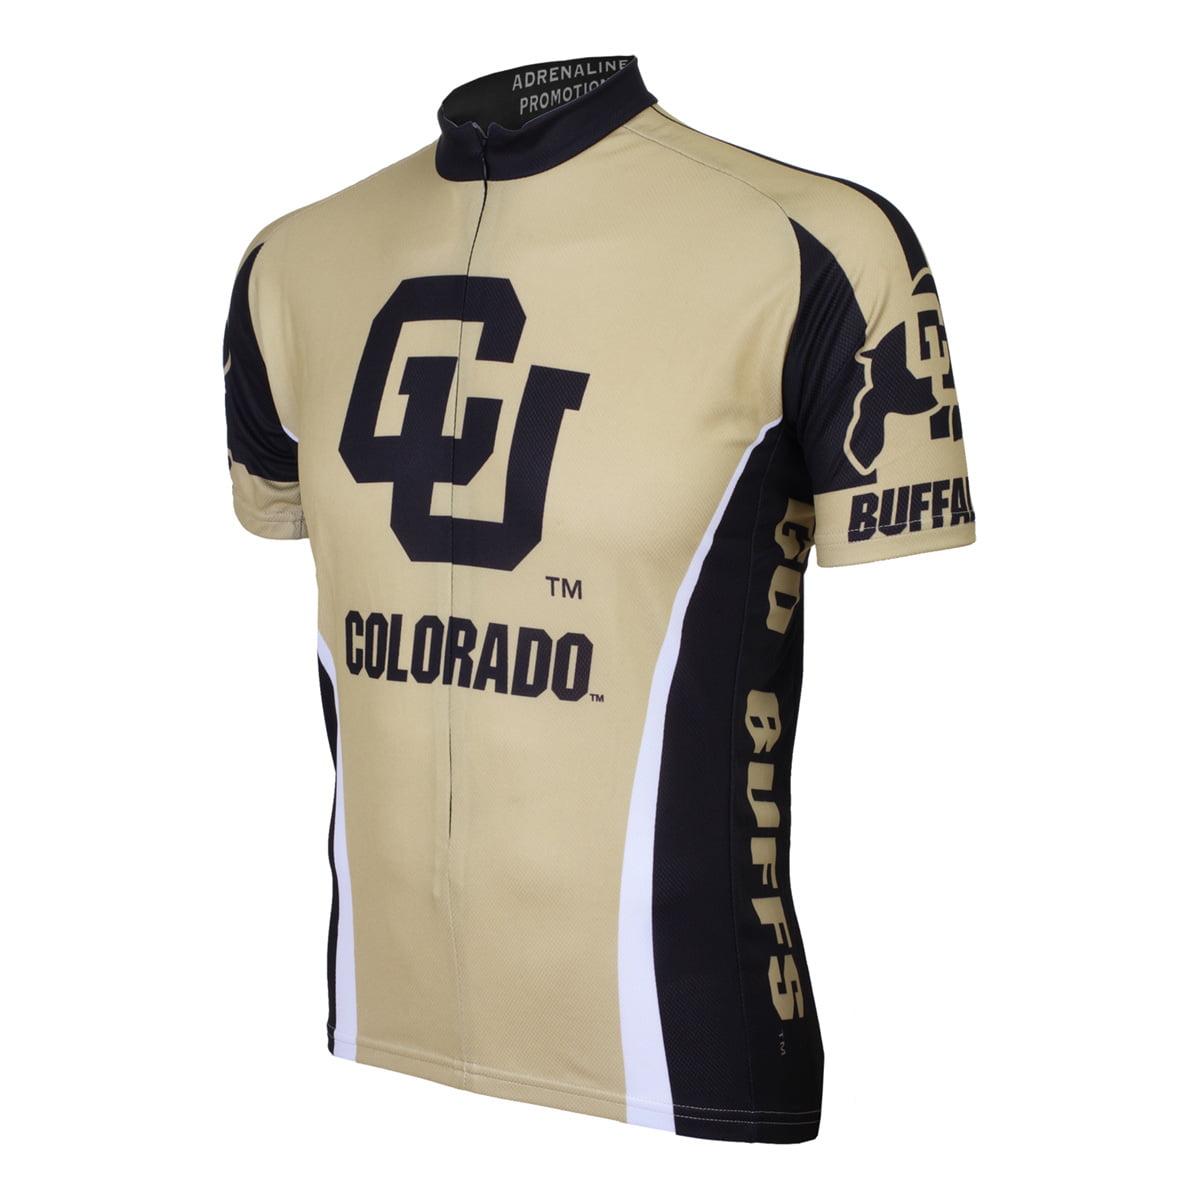 Adrenaline Promotions Colorado University Buffs Cycling Jersey